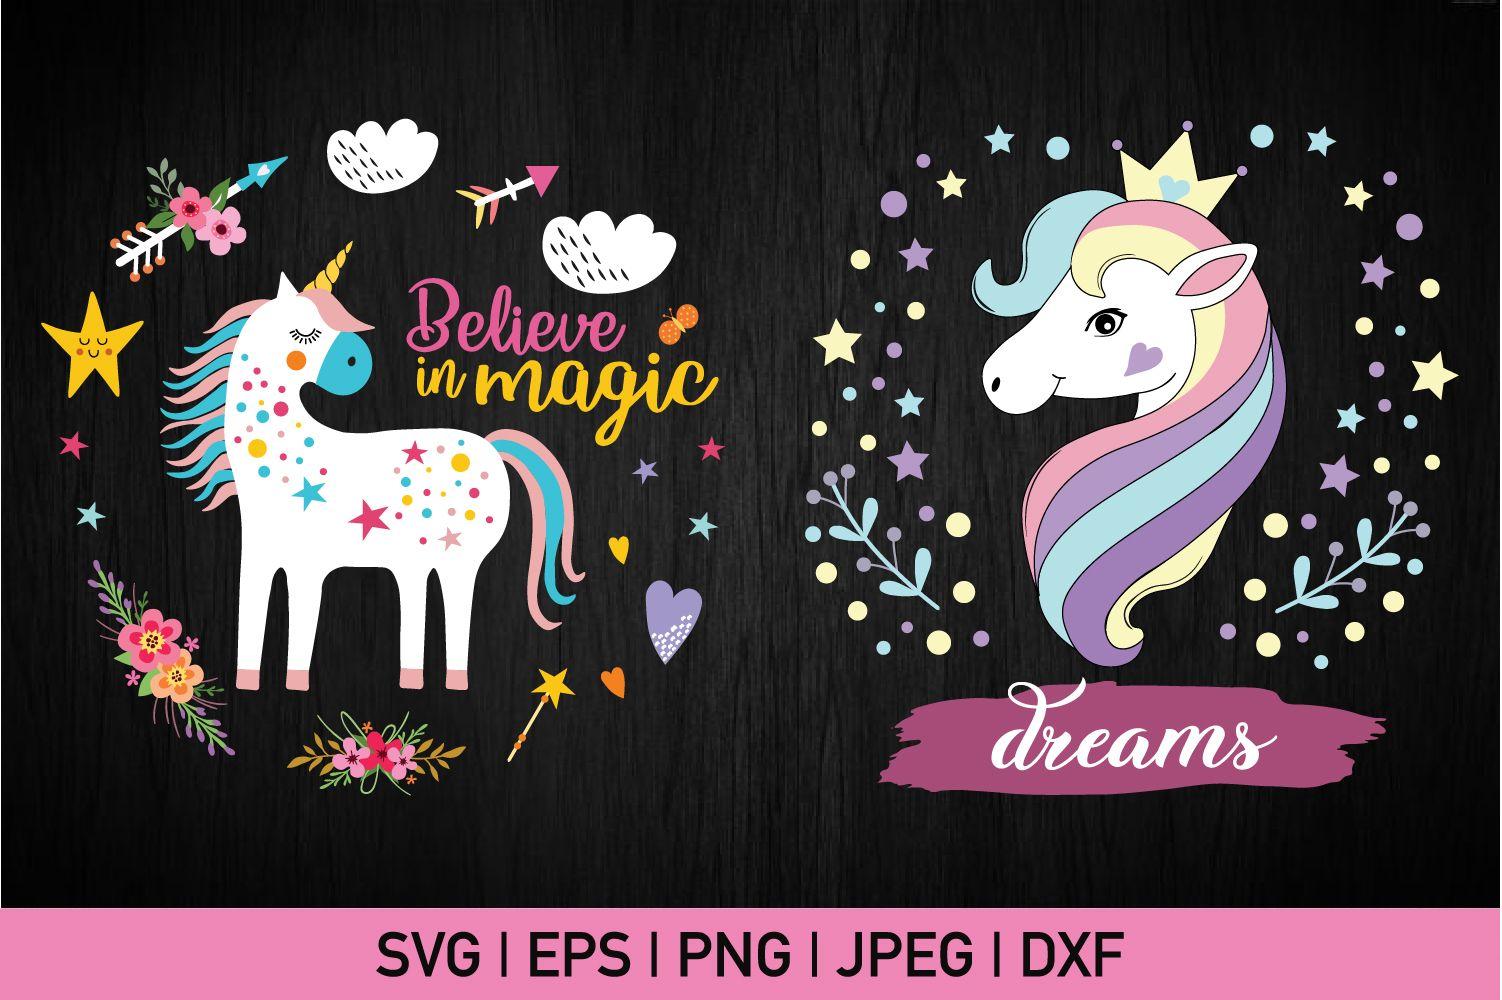 I Believe In Magic Beautiful Unicorn Graphic By Crazypandasvg Creative Fabrica